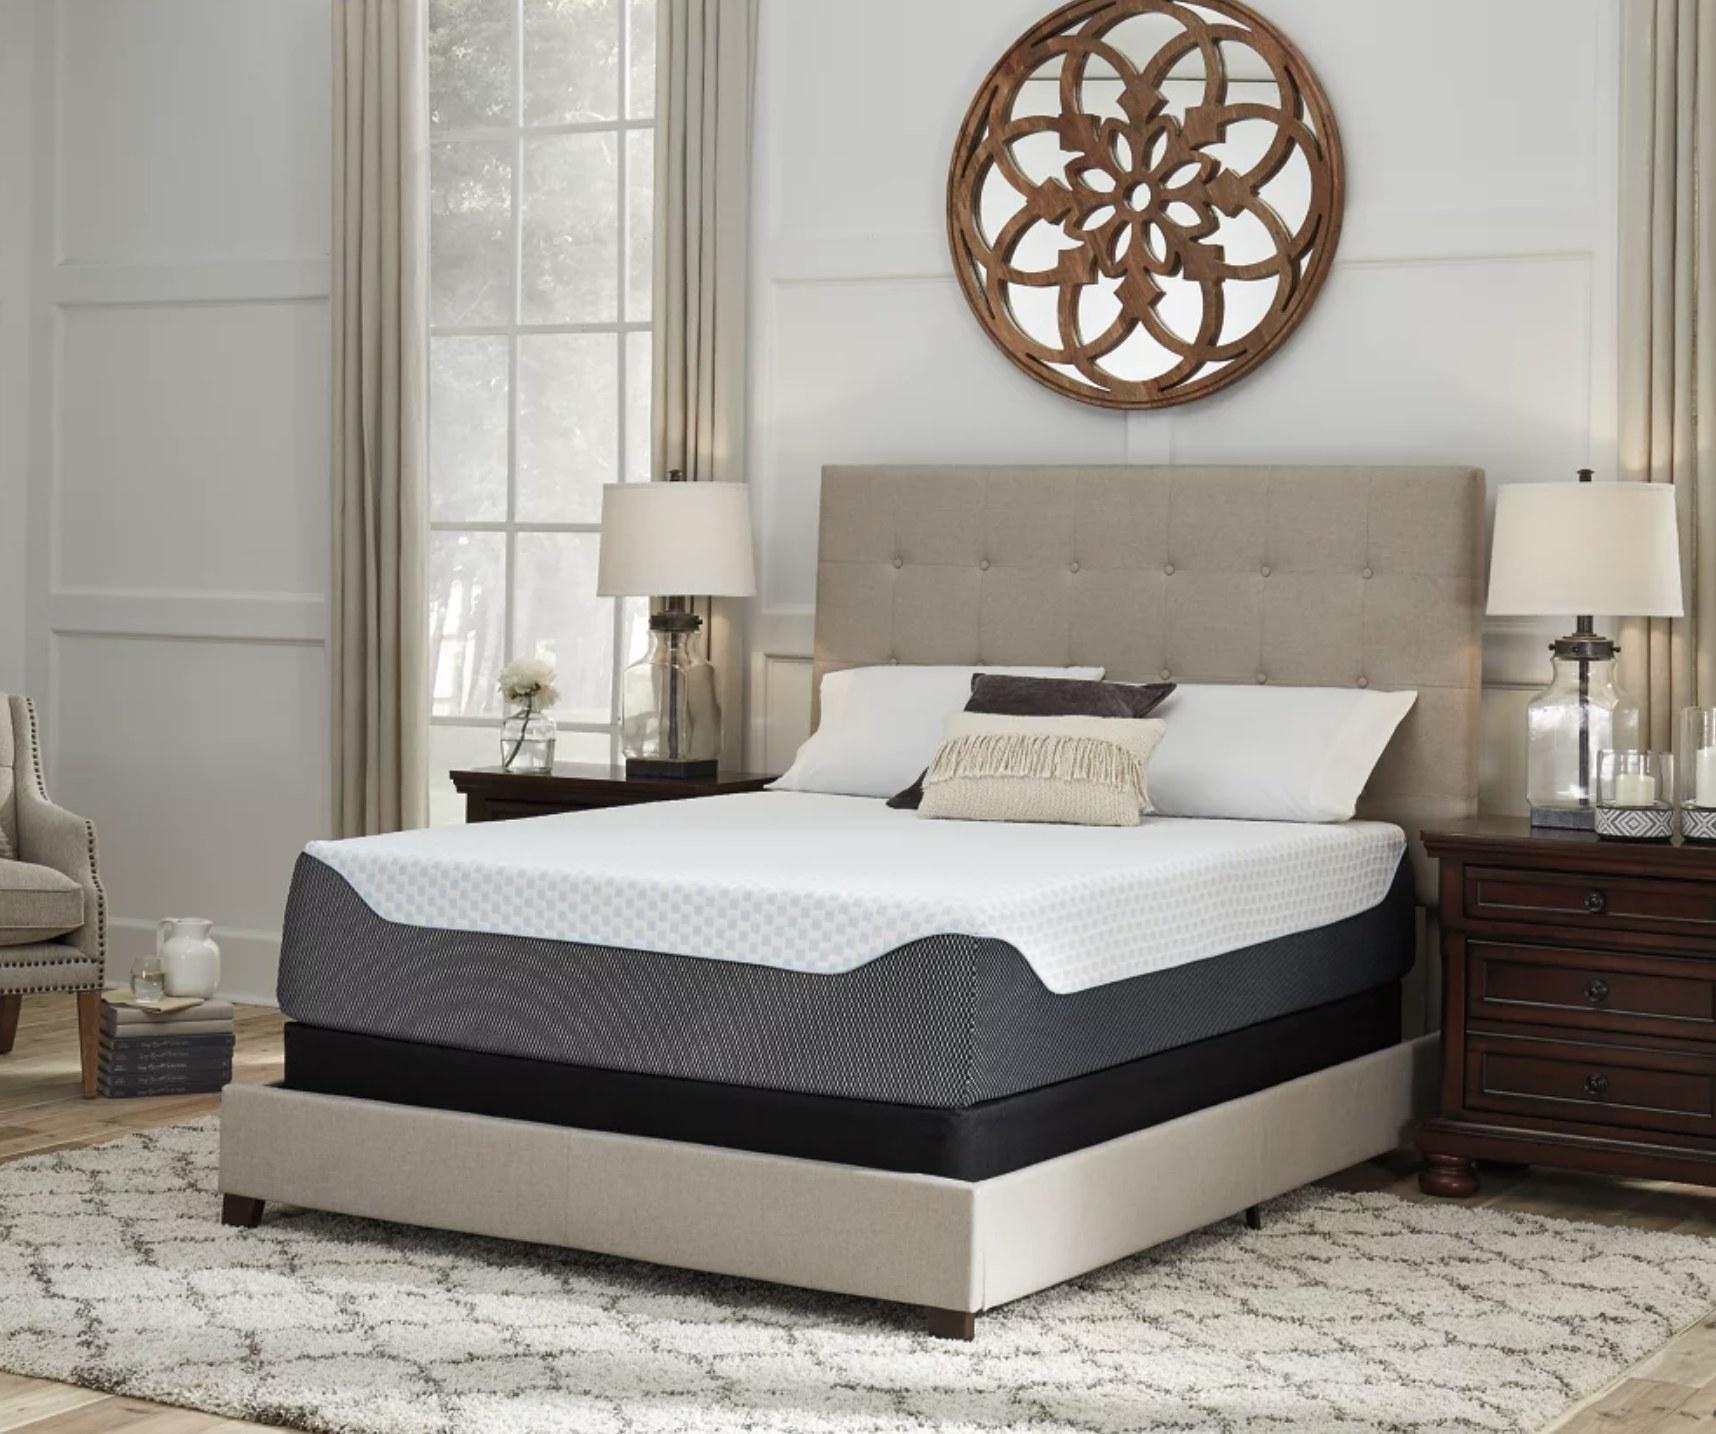 A white fabric frame and memory foam mattress